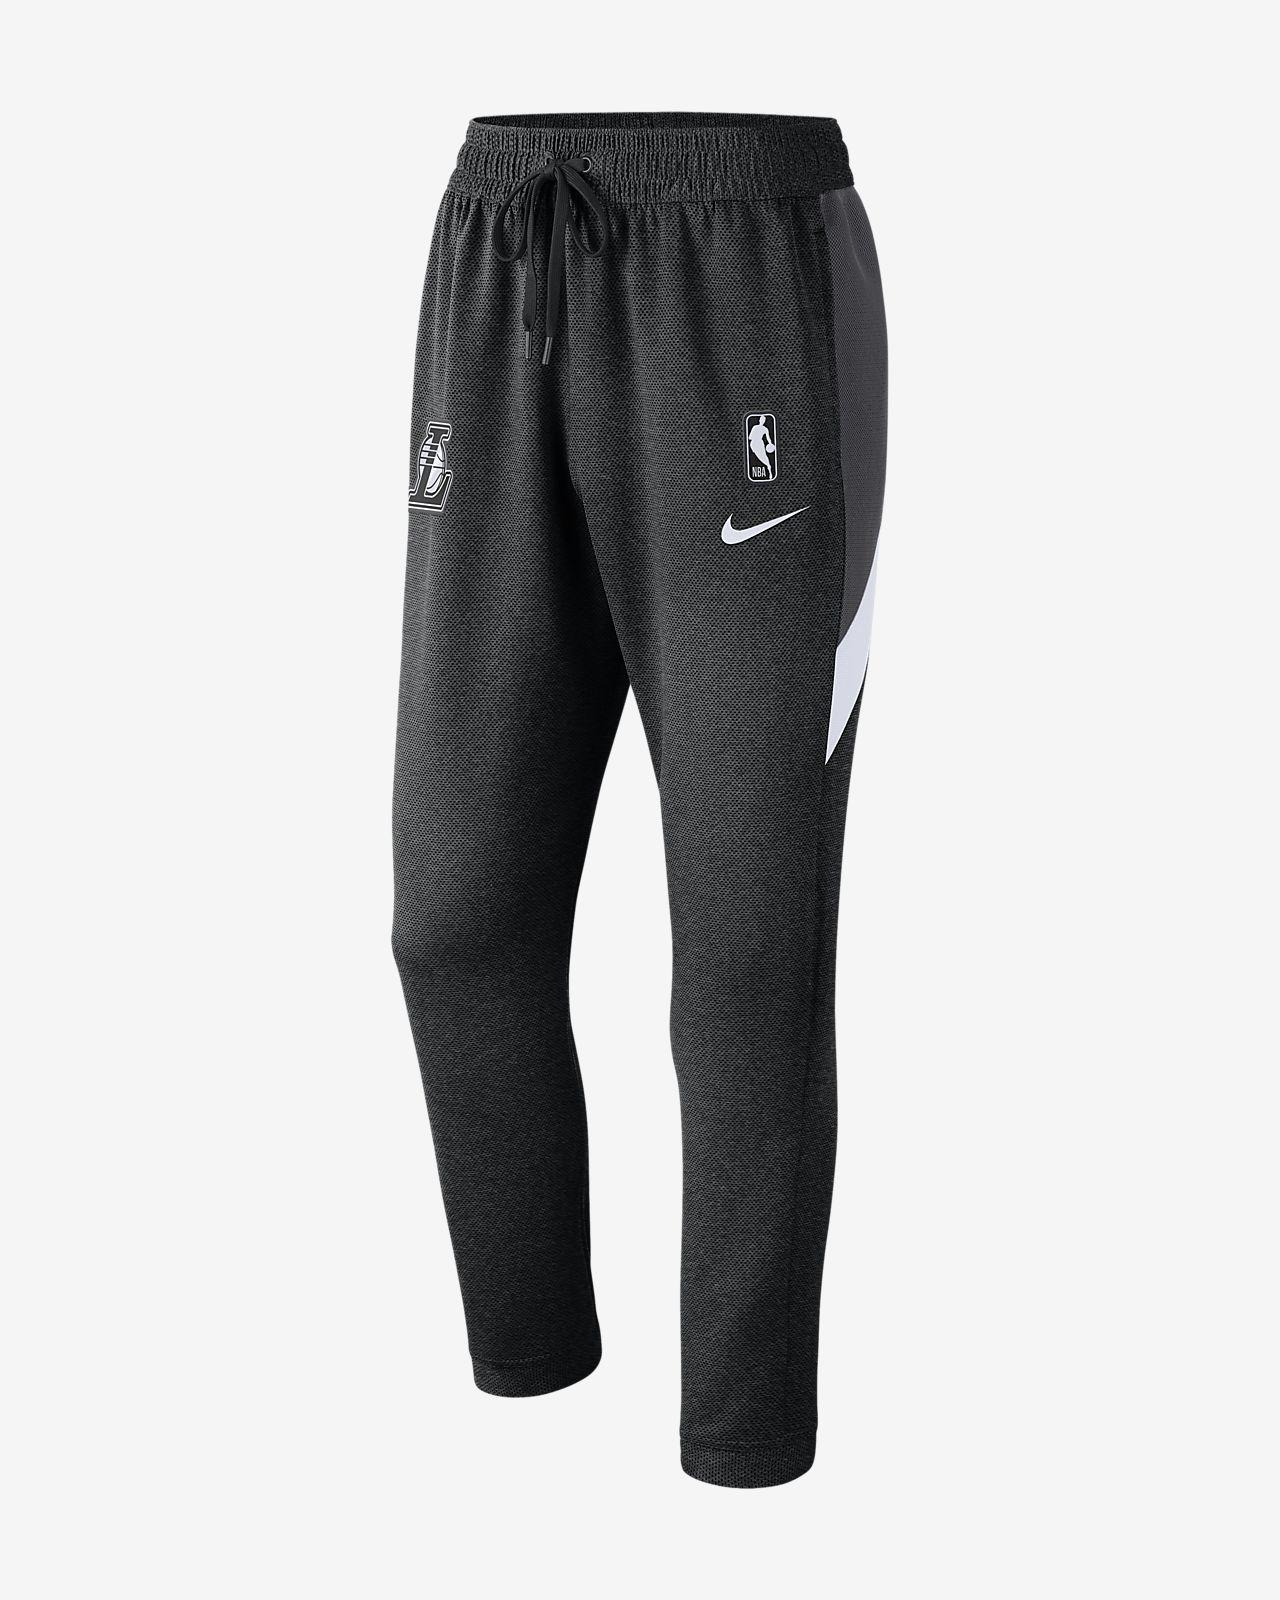 Pantalon NBA Los Angeles Lakers Nike Therma Flex Showtime pour Homme